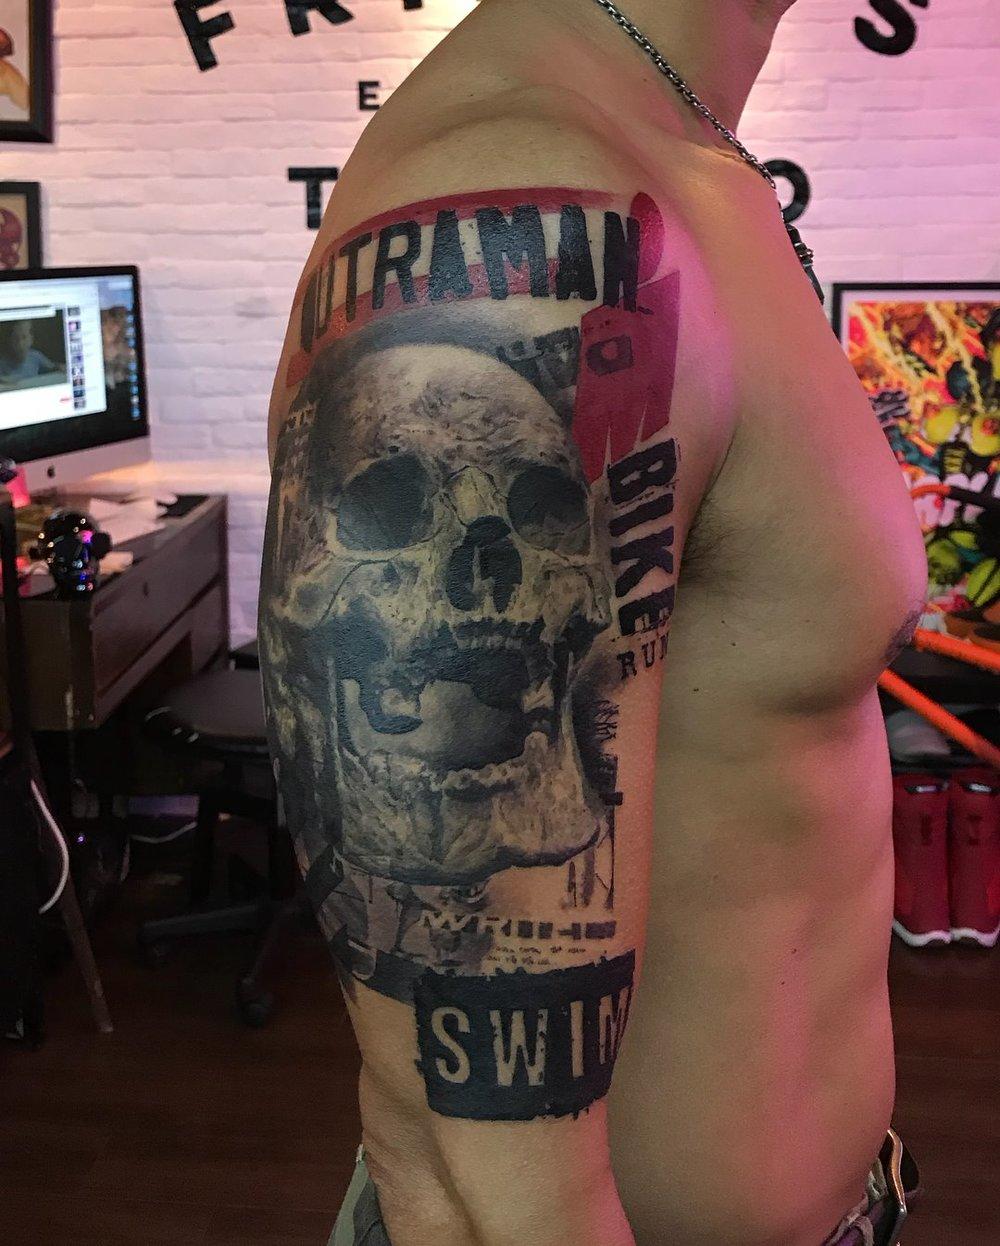 2018-fridays-tattoo-hong-kong-jamie-graphic-skull-sleeve-2.jpg